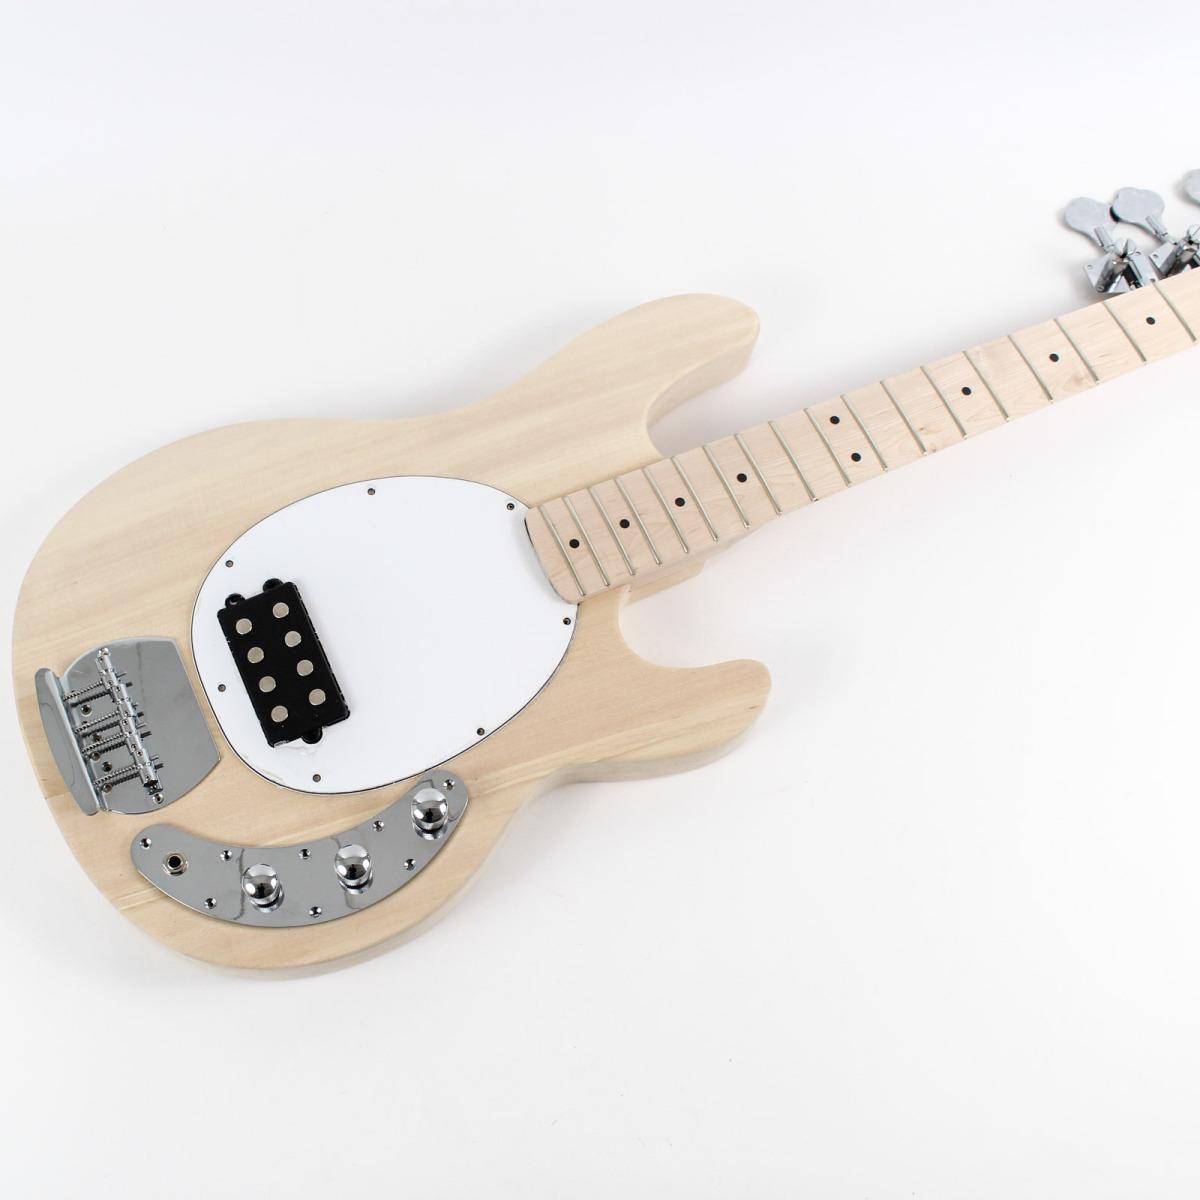 Music Man Stingray Bass Guitar Kit Diy Guitars